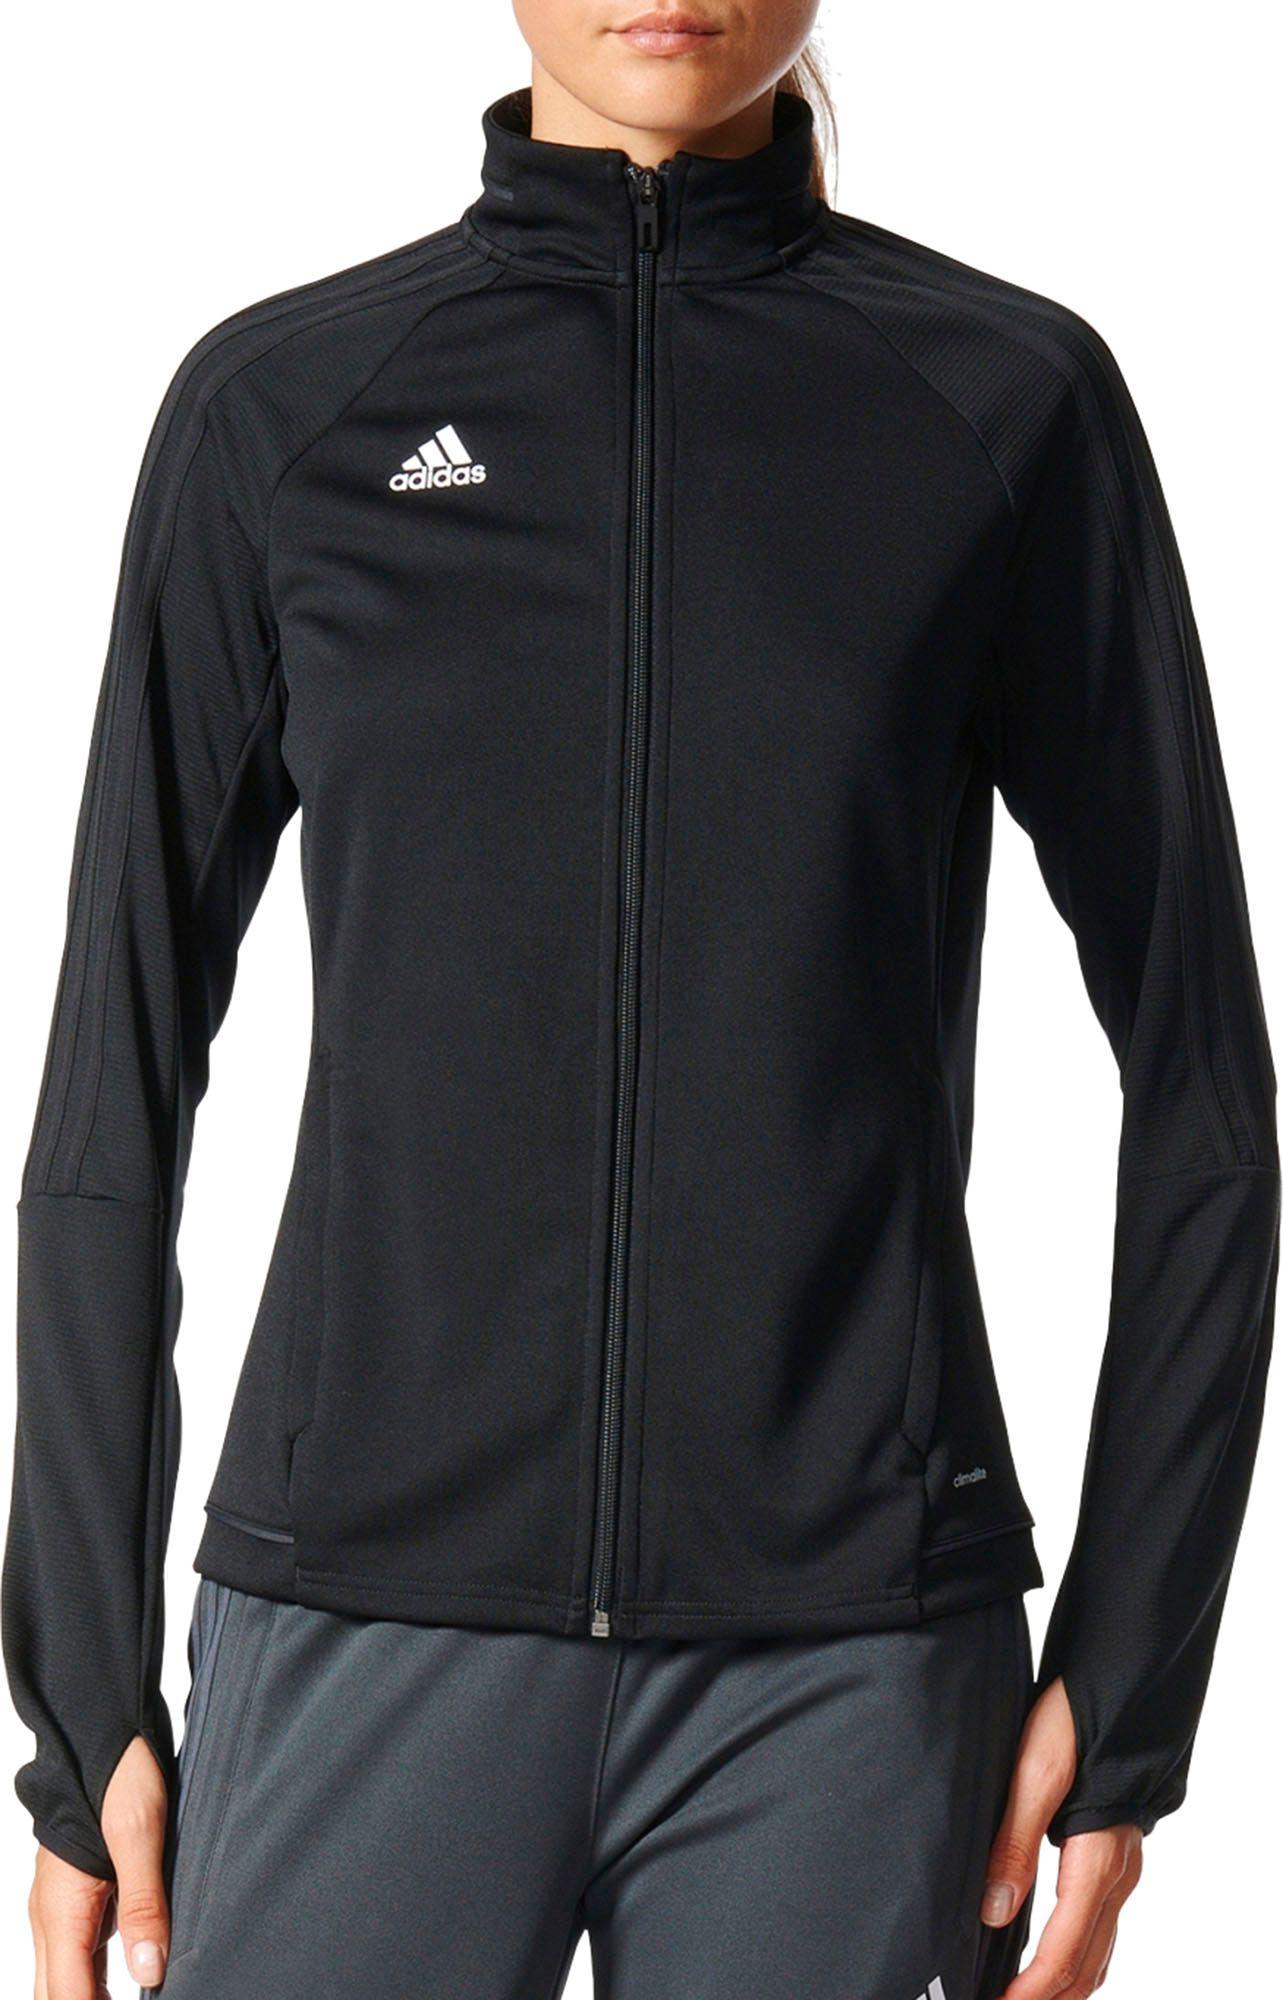 Adidas  mujer chaqueta 's tiro 17 Woven chaqueta mujer de entrenamiento de futbol de Dick 4af63e